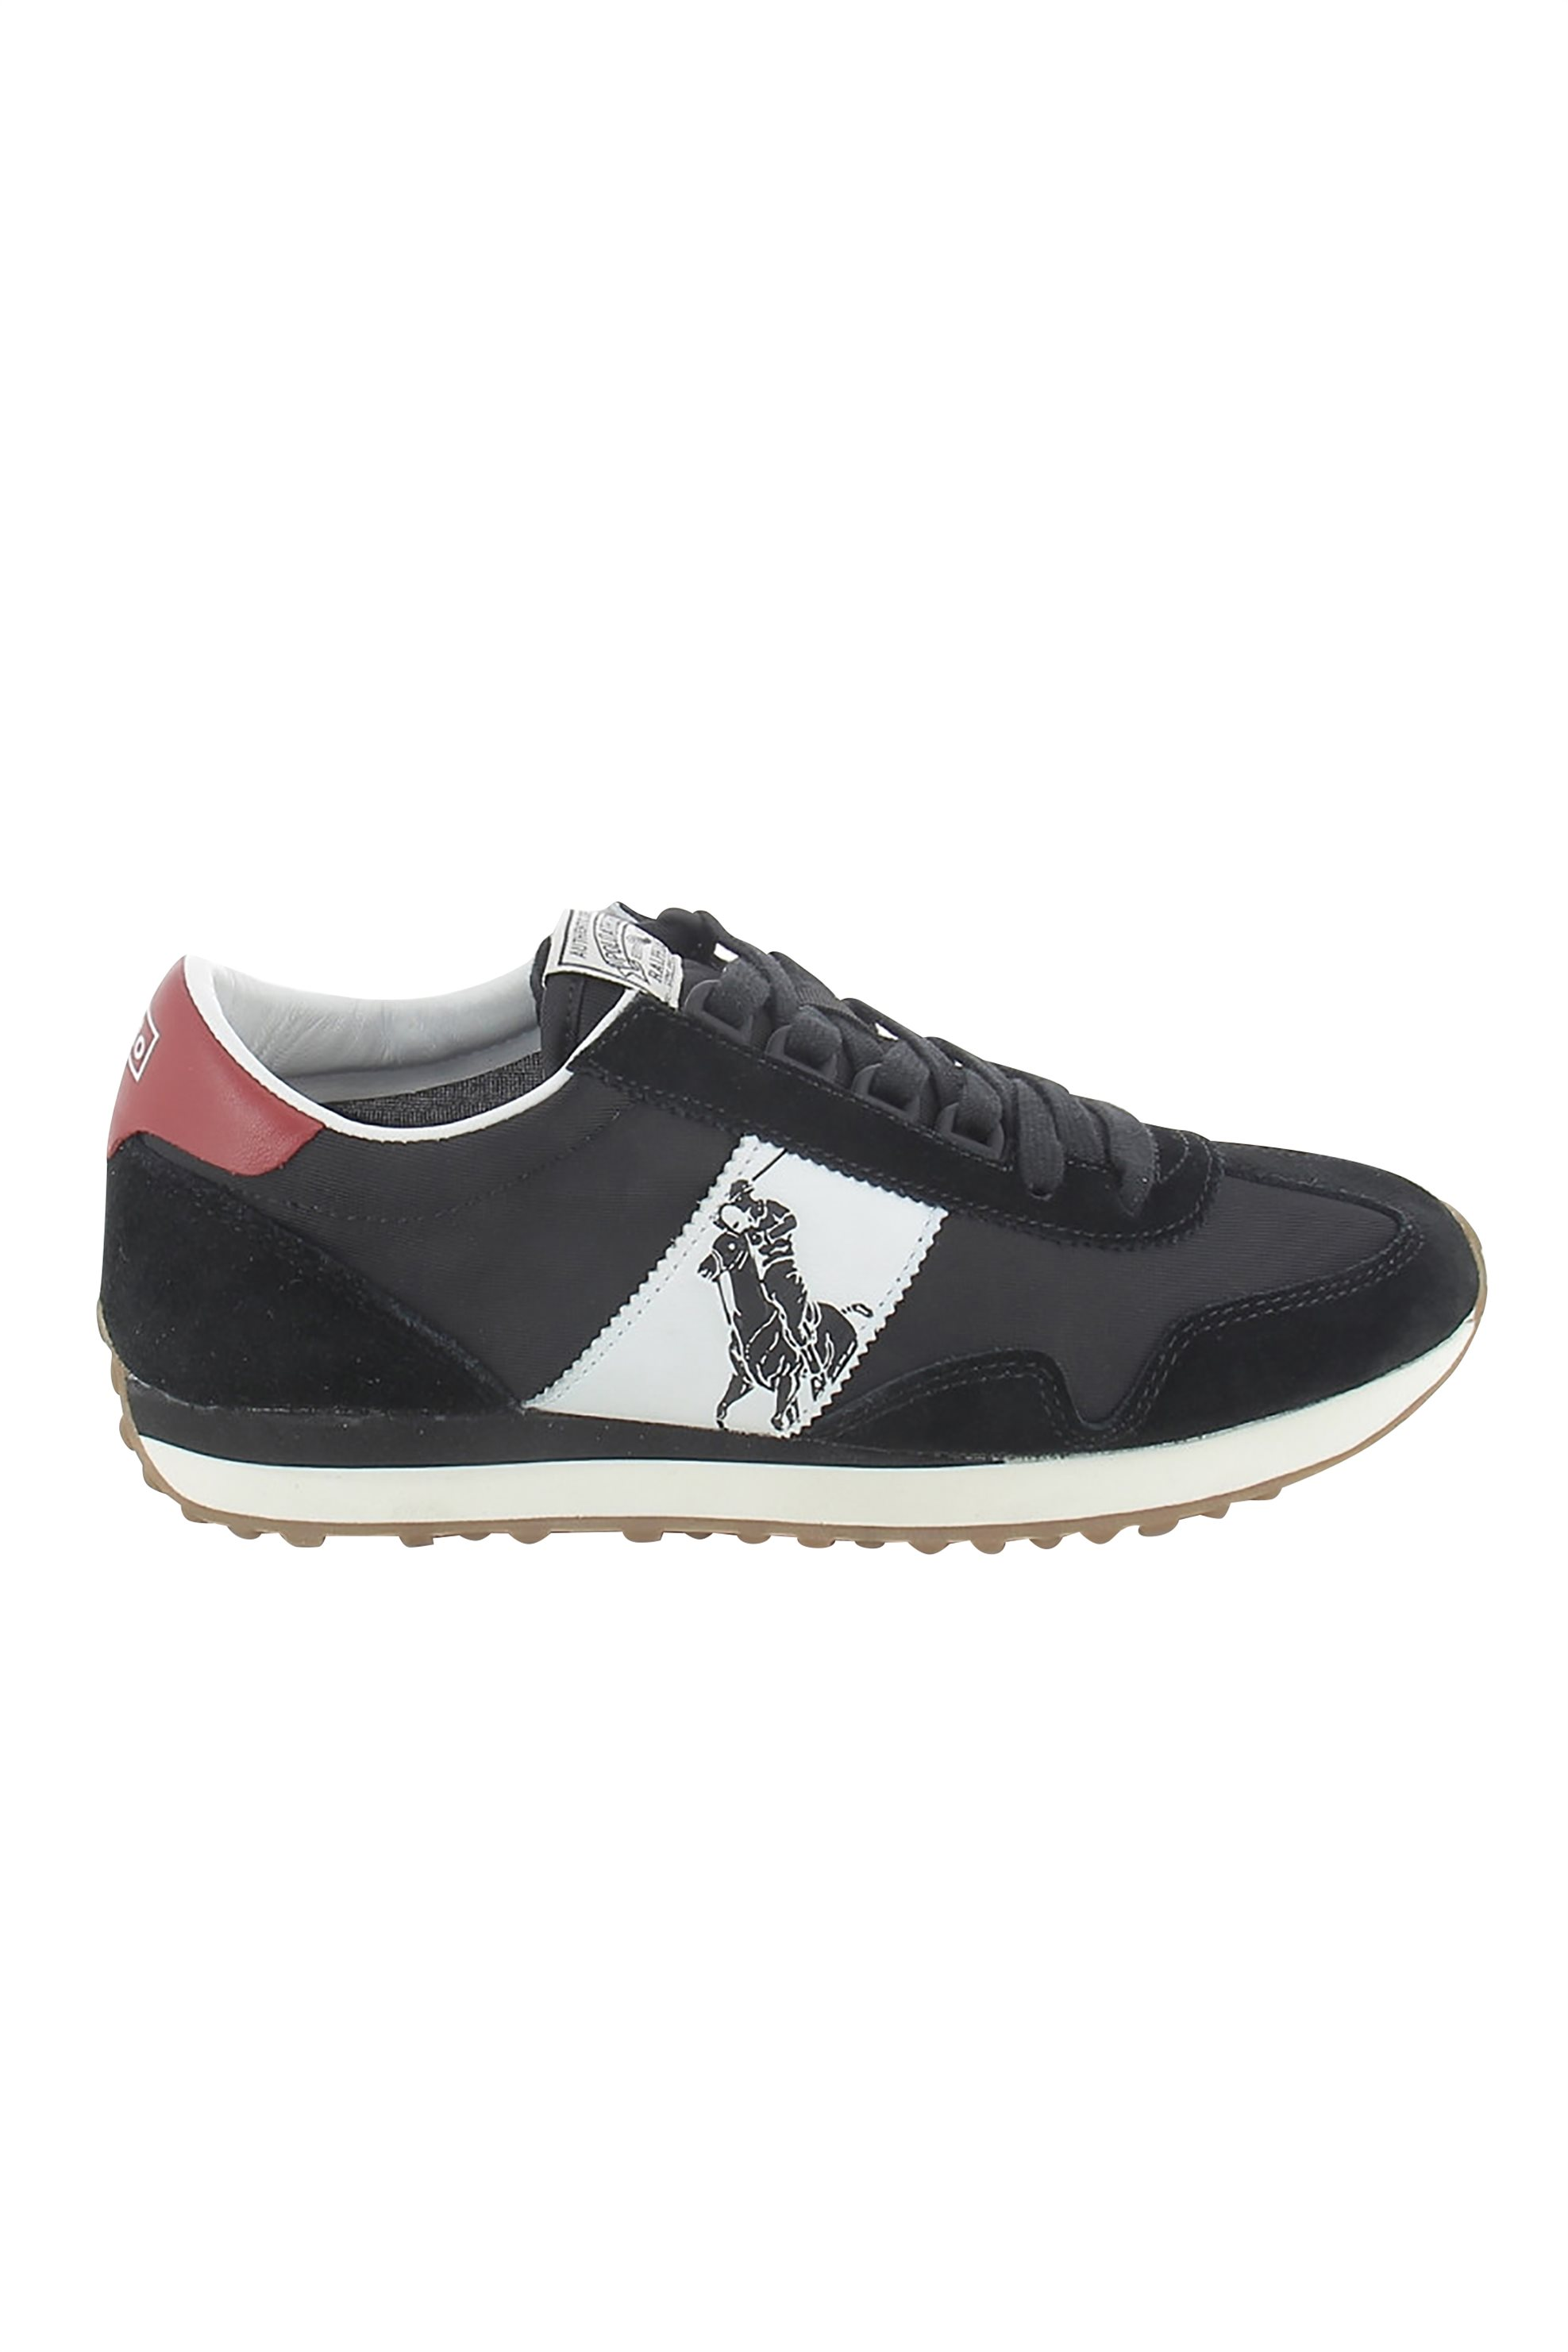 Polo Ralph Lauren ανδρικά sneakers με μεγάλο logo – 809755192007 – Μαύρο